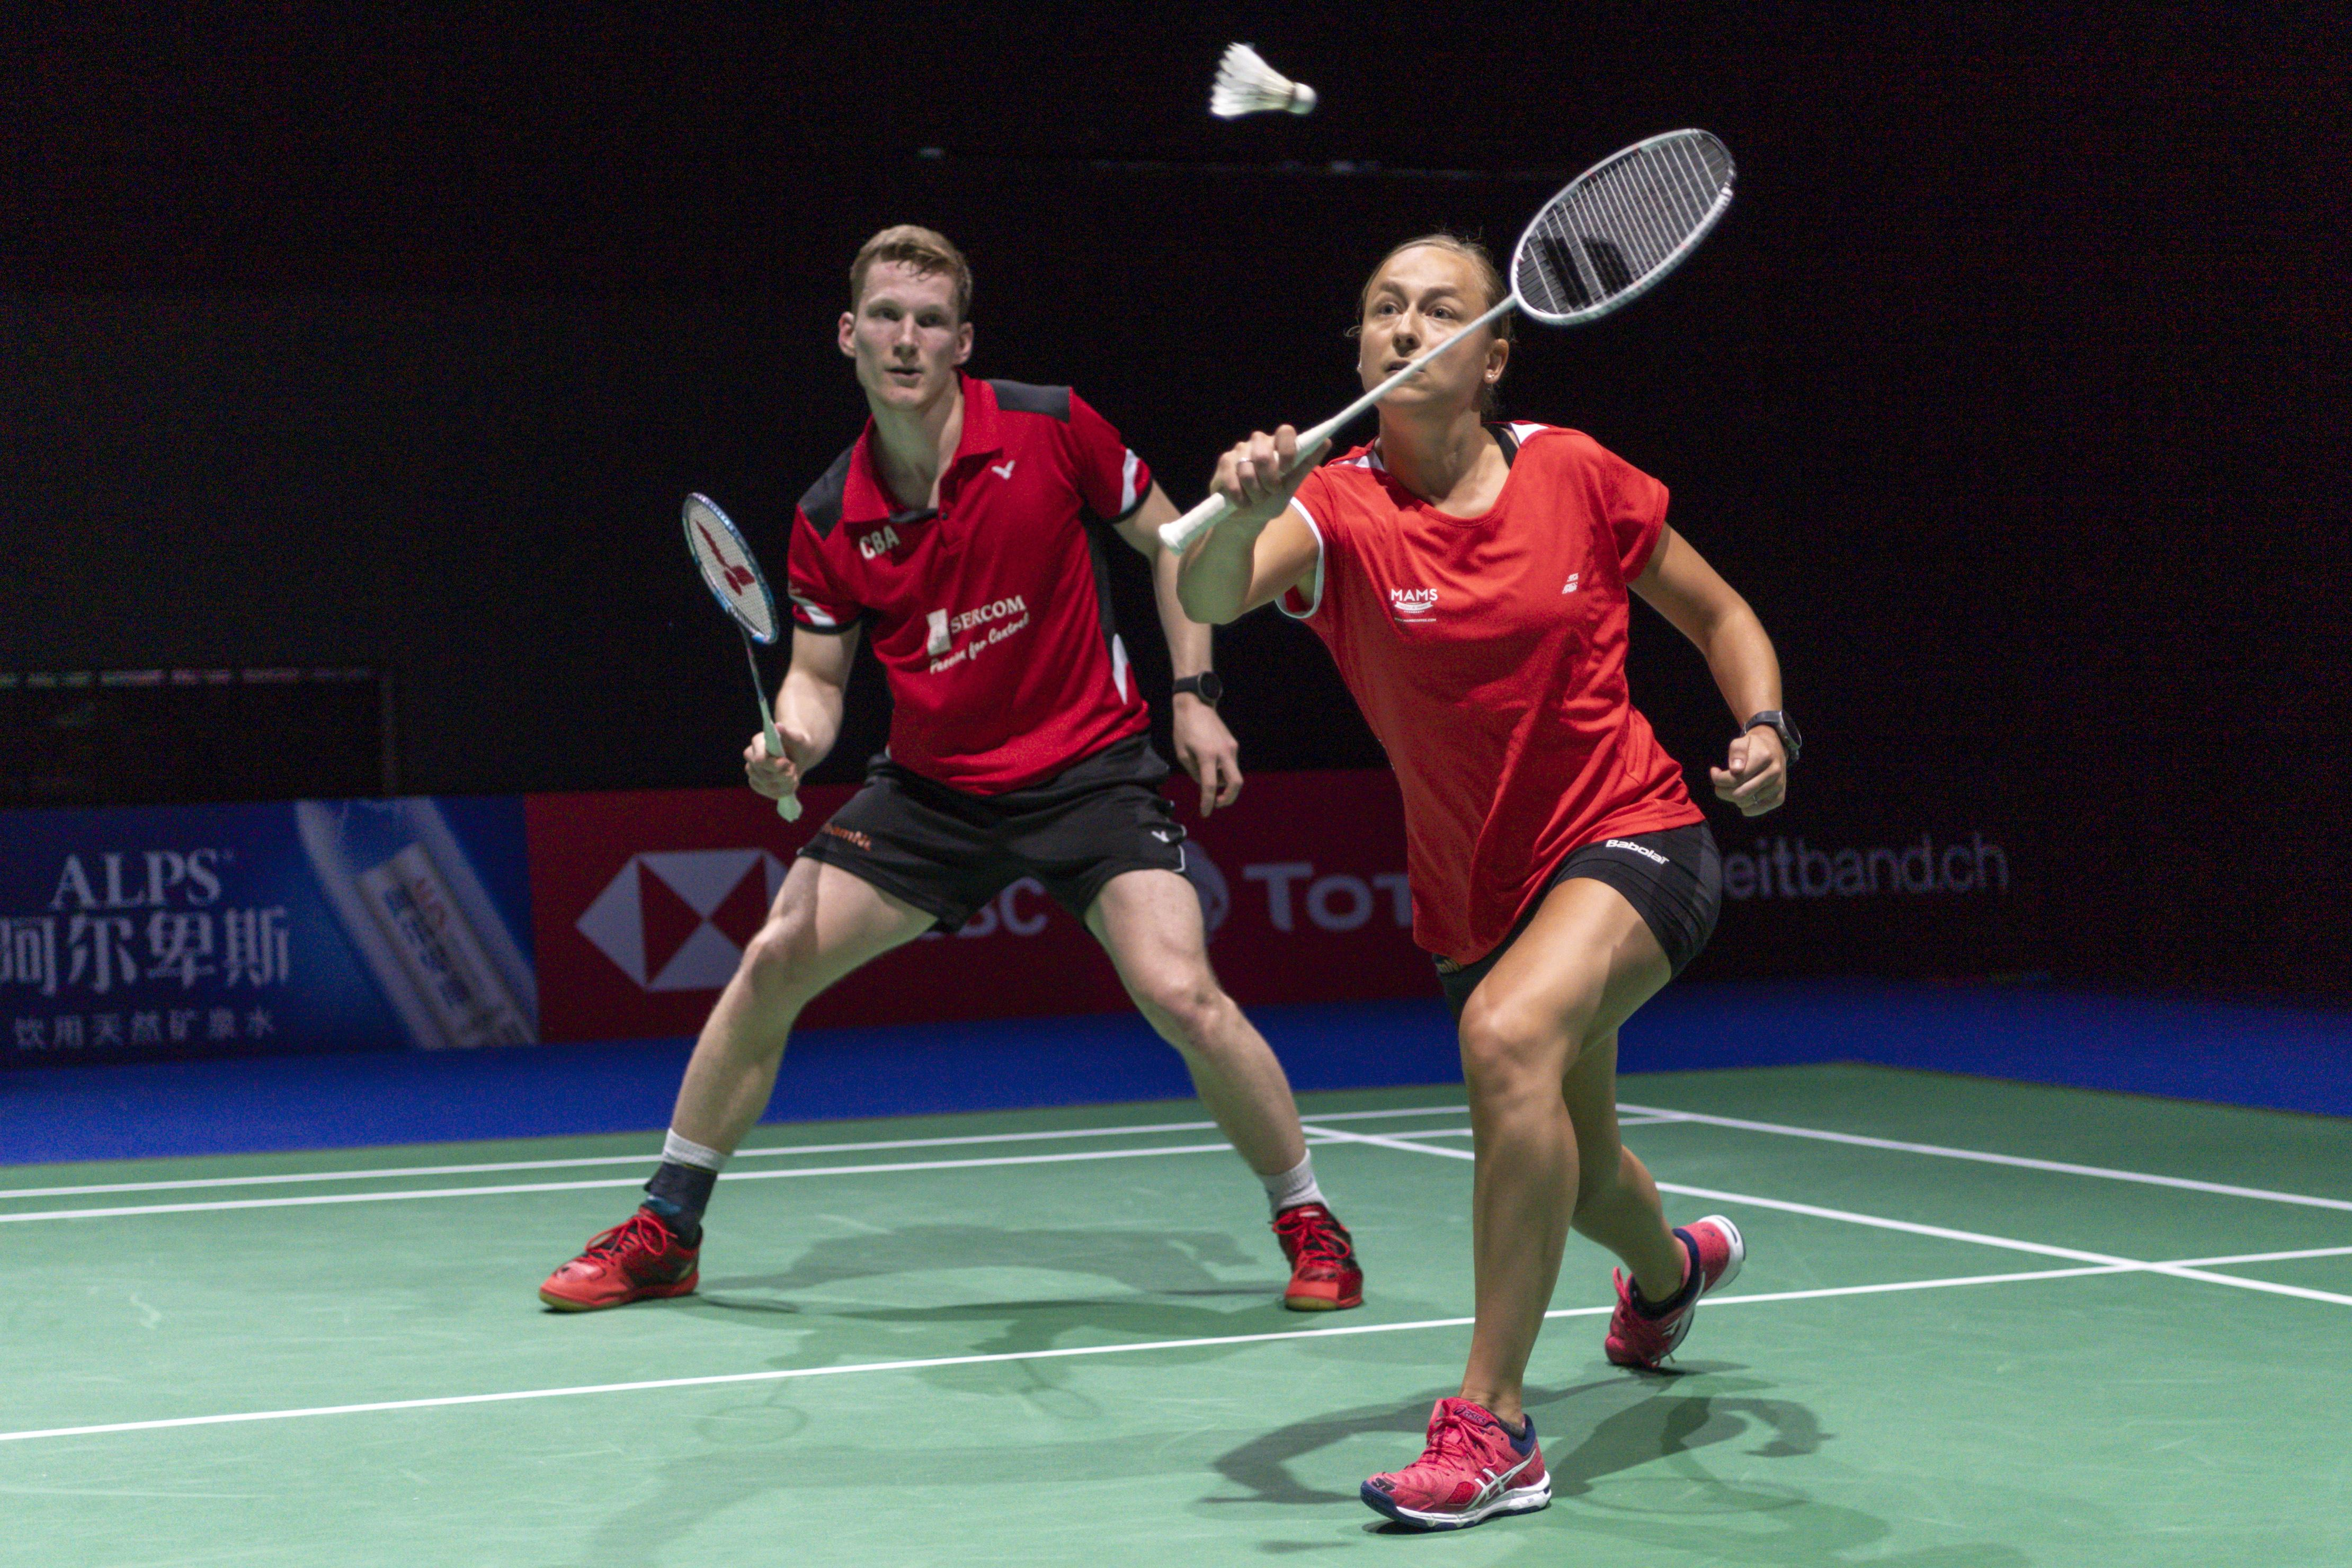 Badmintonduo Tabeling/Piek naar finale gemengd dubbelspel Dutch Open